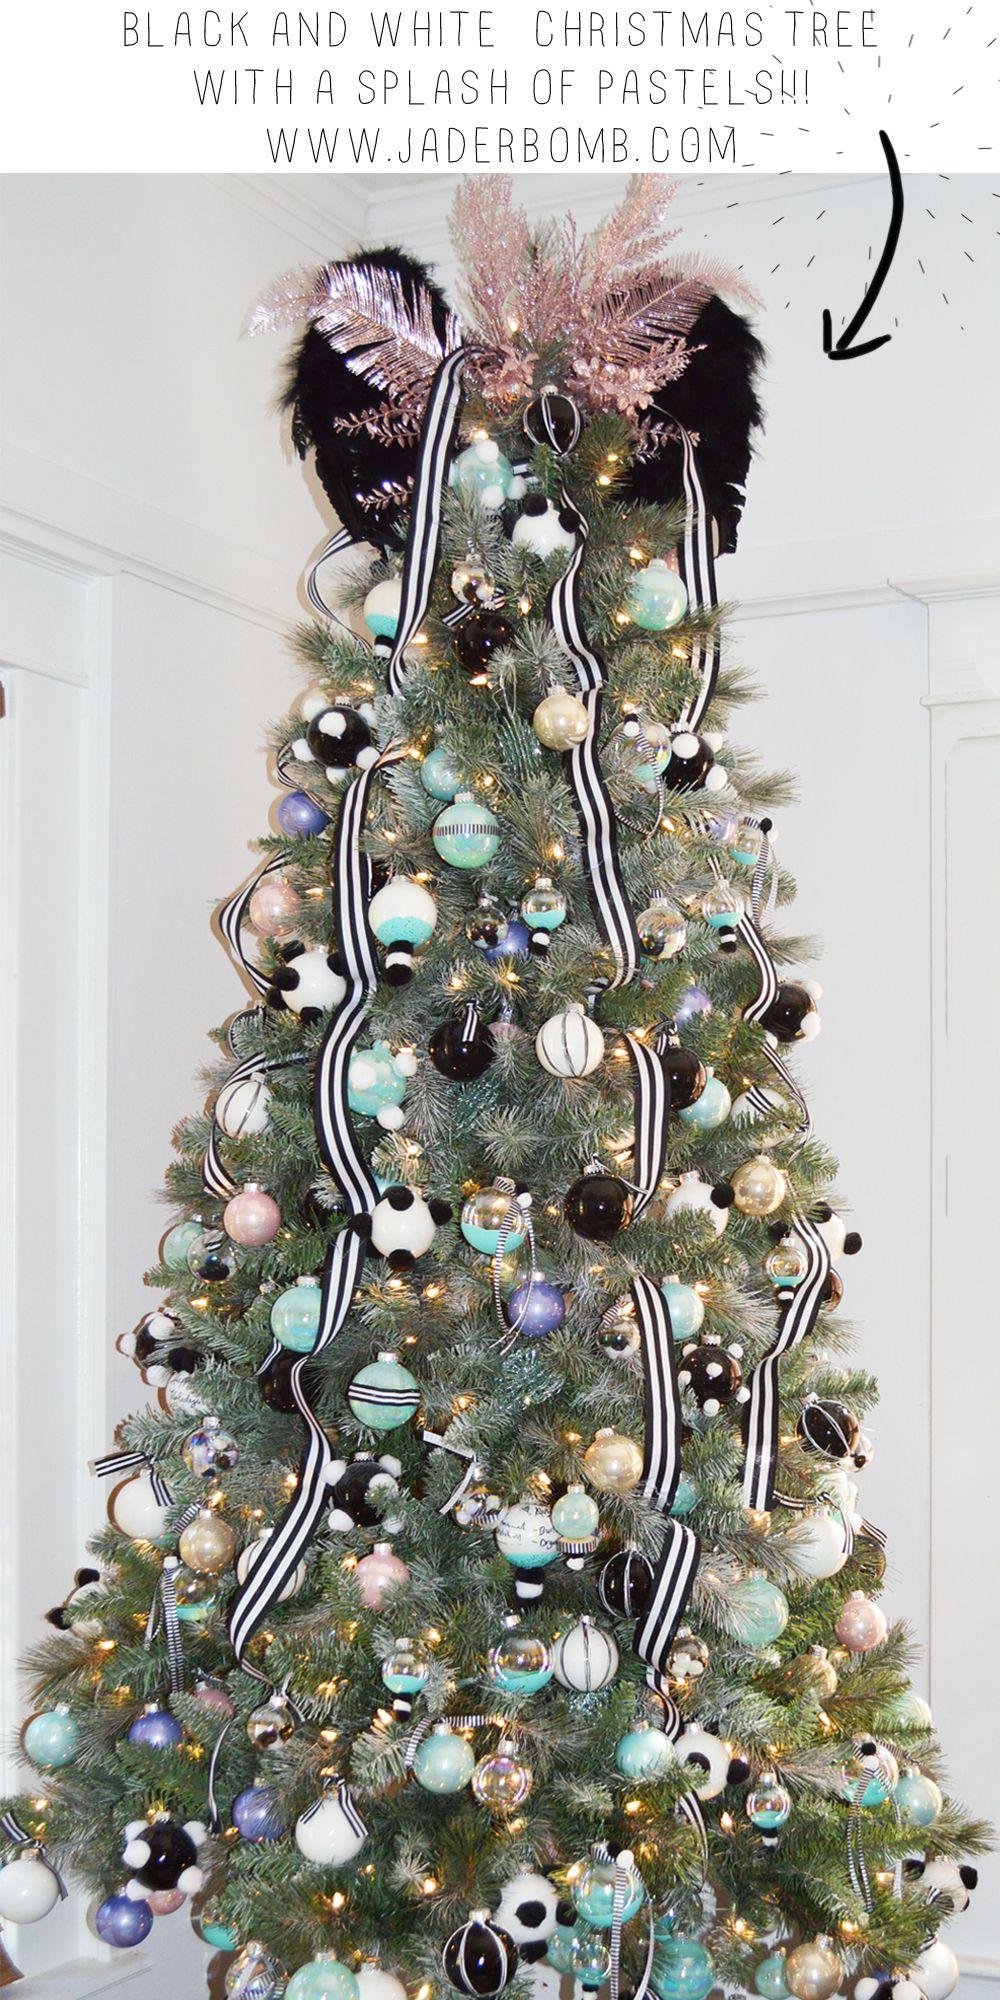 Michaels Dream Tree Challenge Reveal Jaderbomb Christmas Tree Inspiration Holiday Christmas Tree Christmas Tree Themes